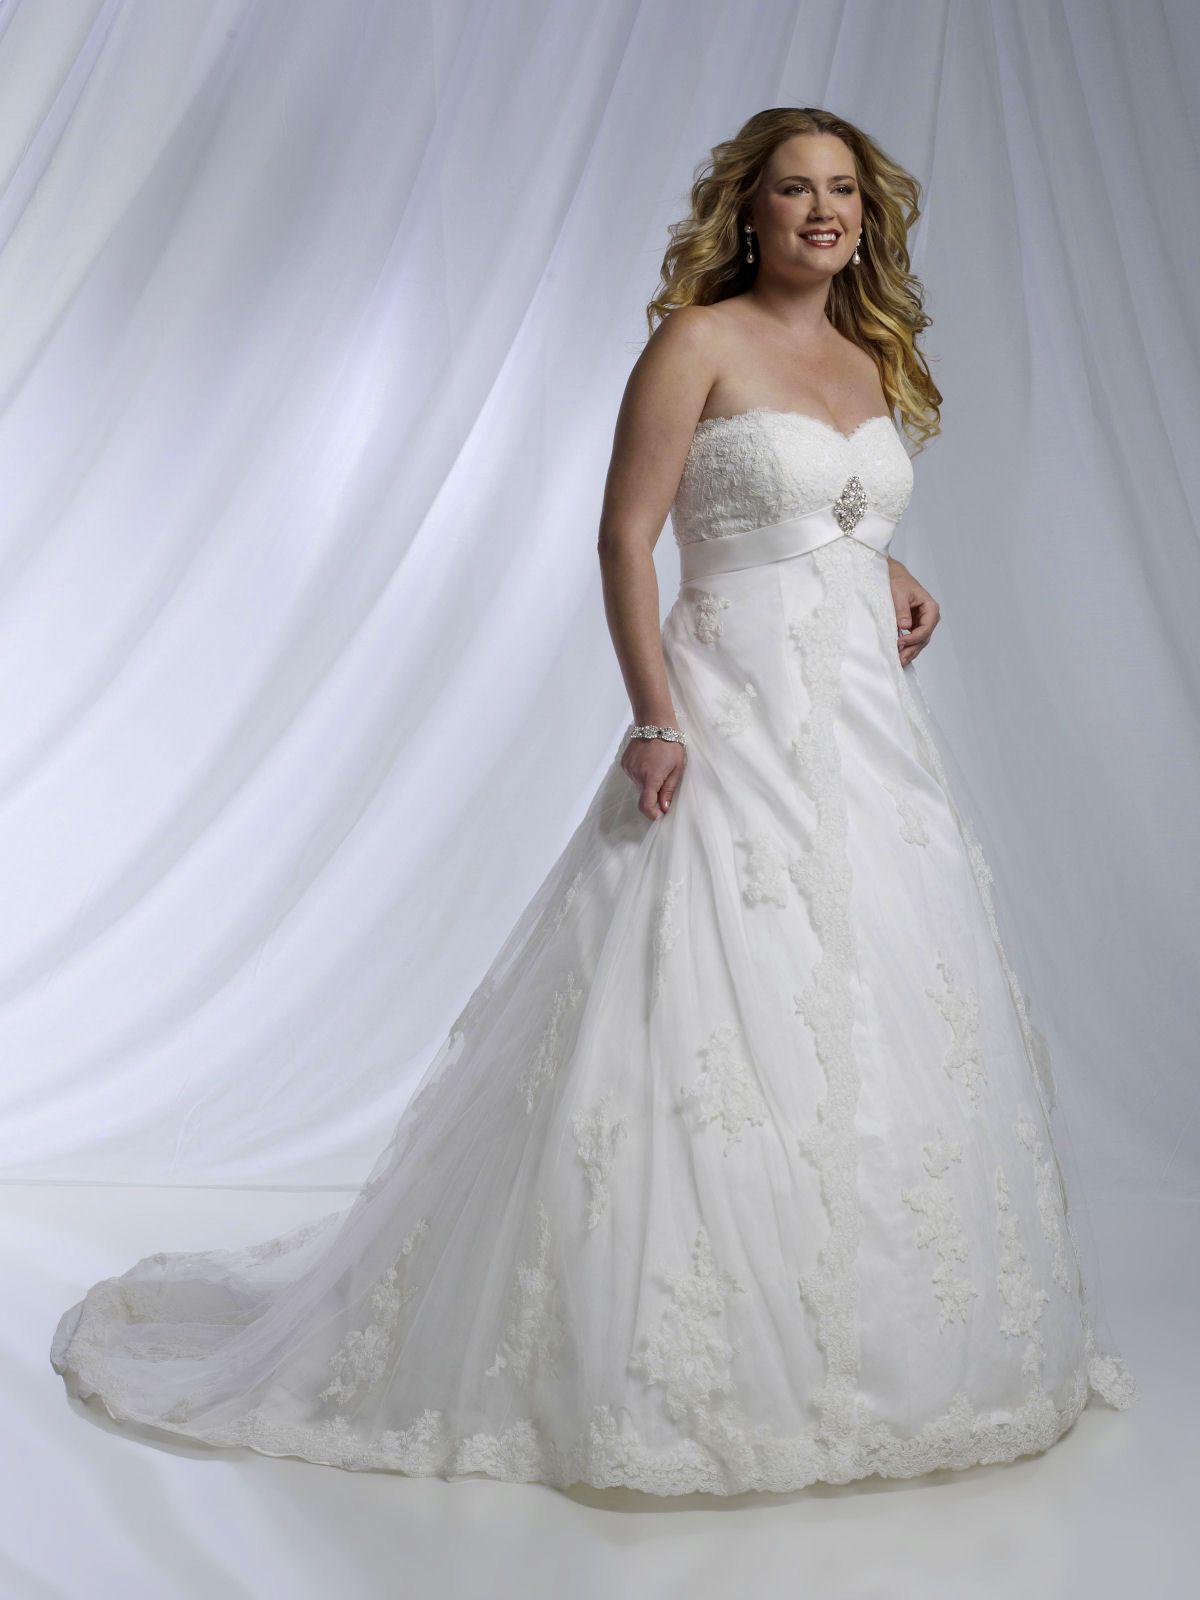 Cara Mira Collection 29218 White/Silver Size 24 | Christina Wu ...